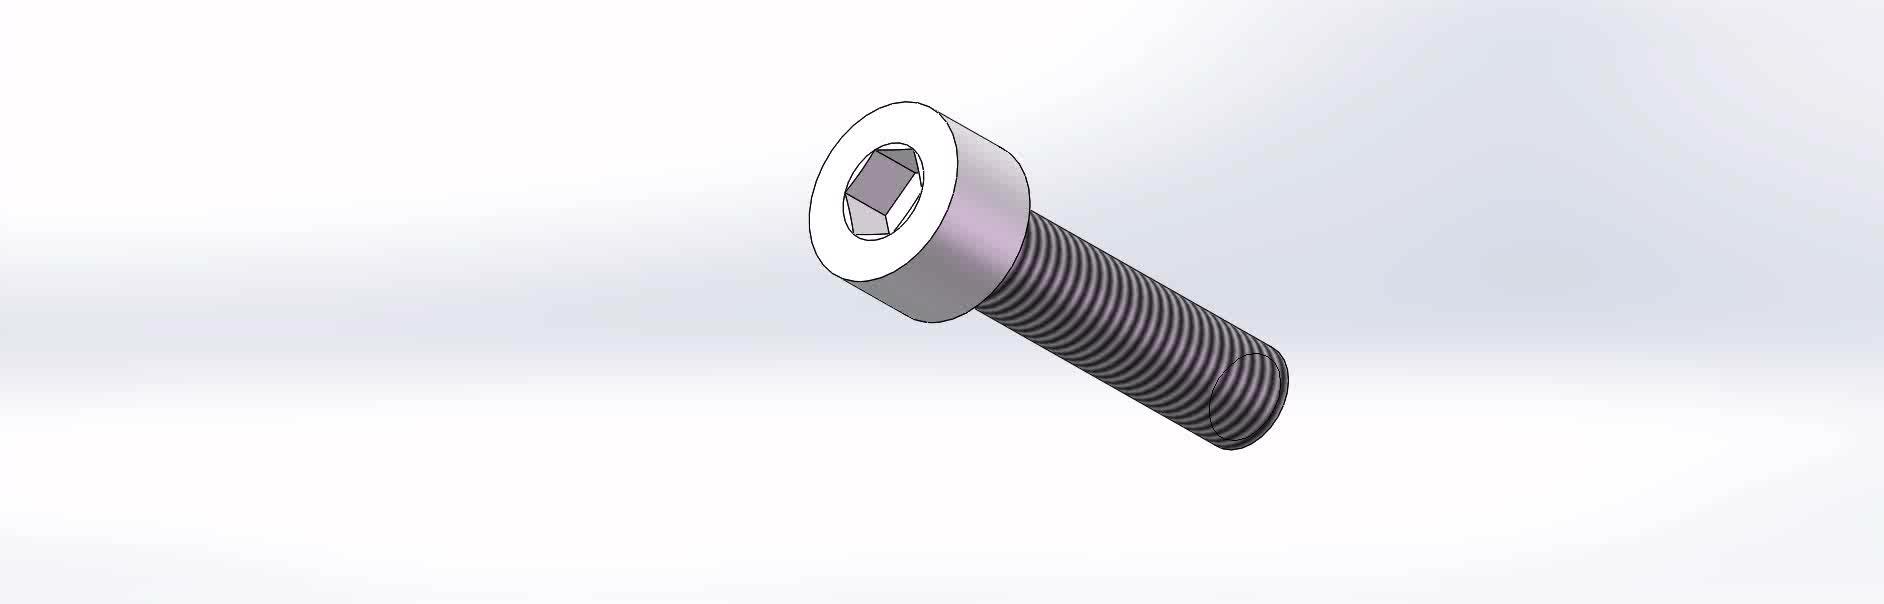 DIN912 Stainless Steel 304 Hexagon Socket Head cap Screw